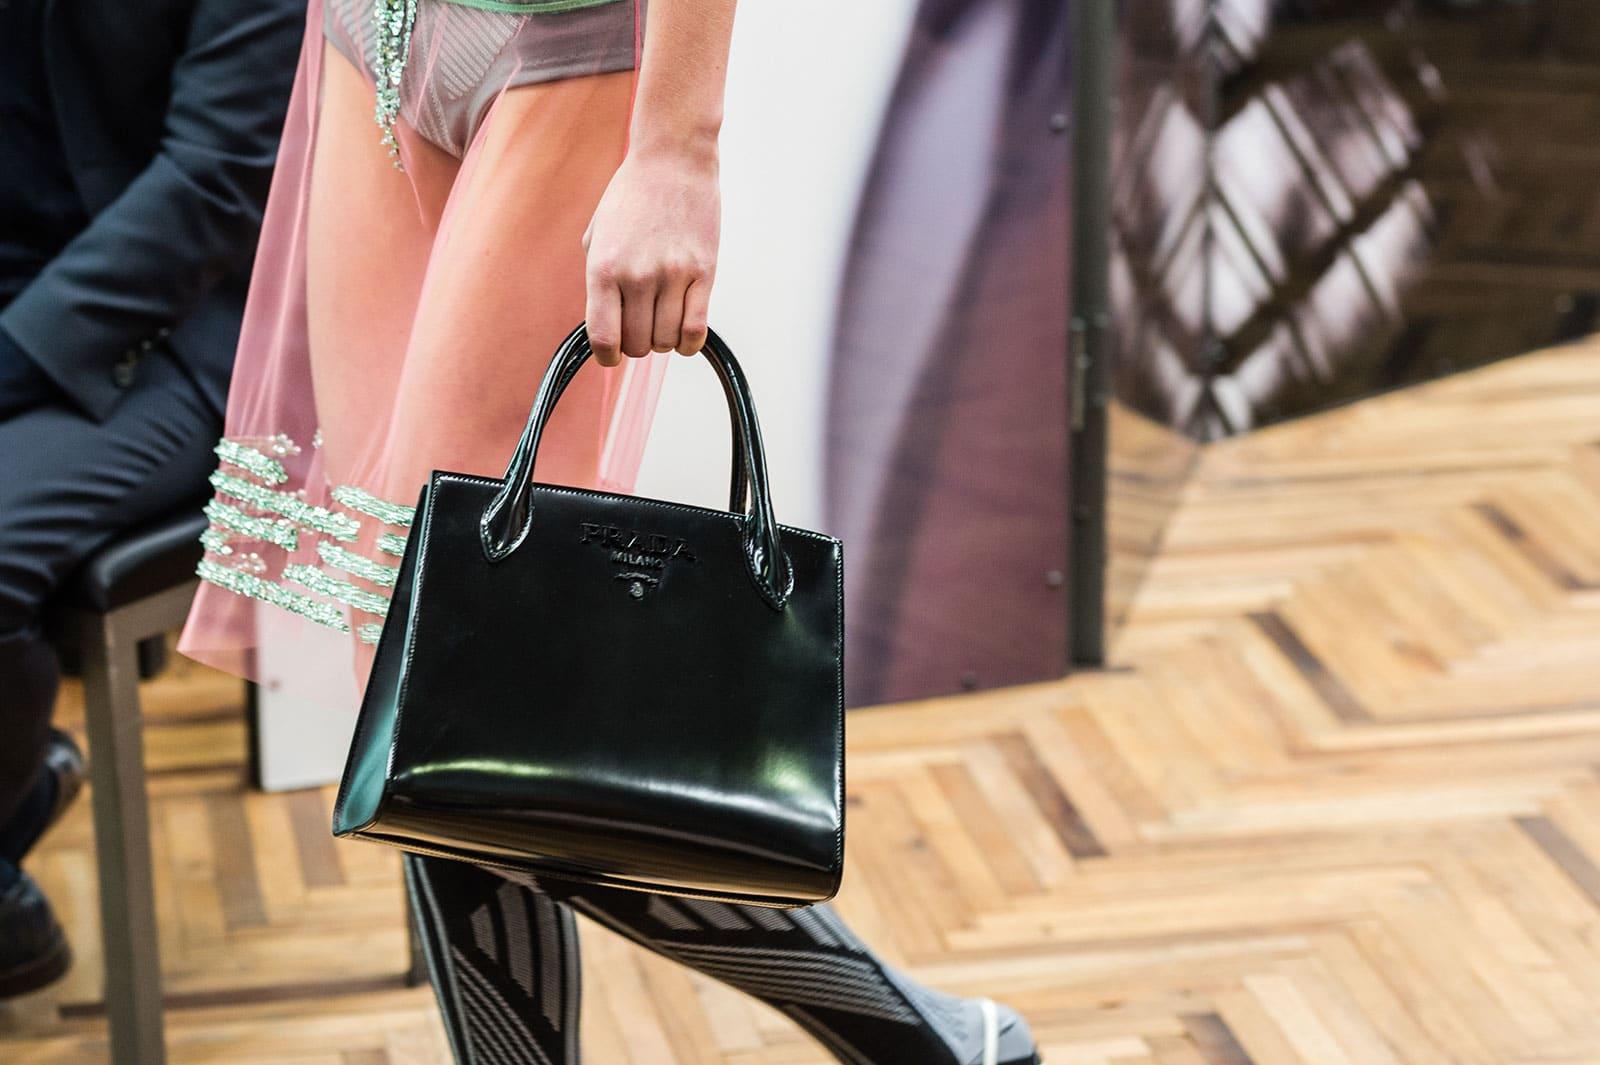 Prada Resort 2018 Runway Bag Collection – Spotted Fashion